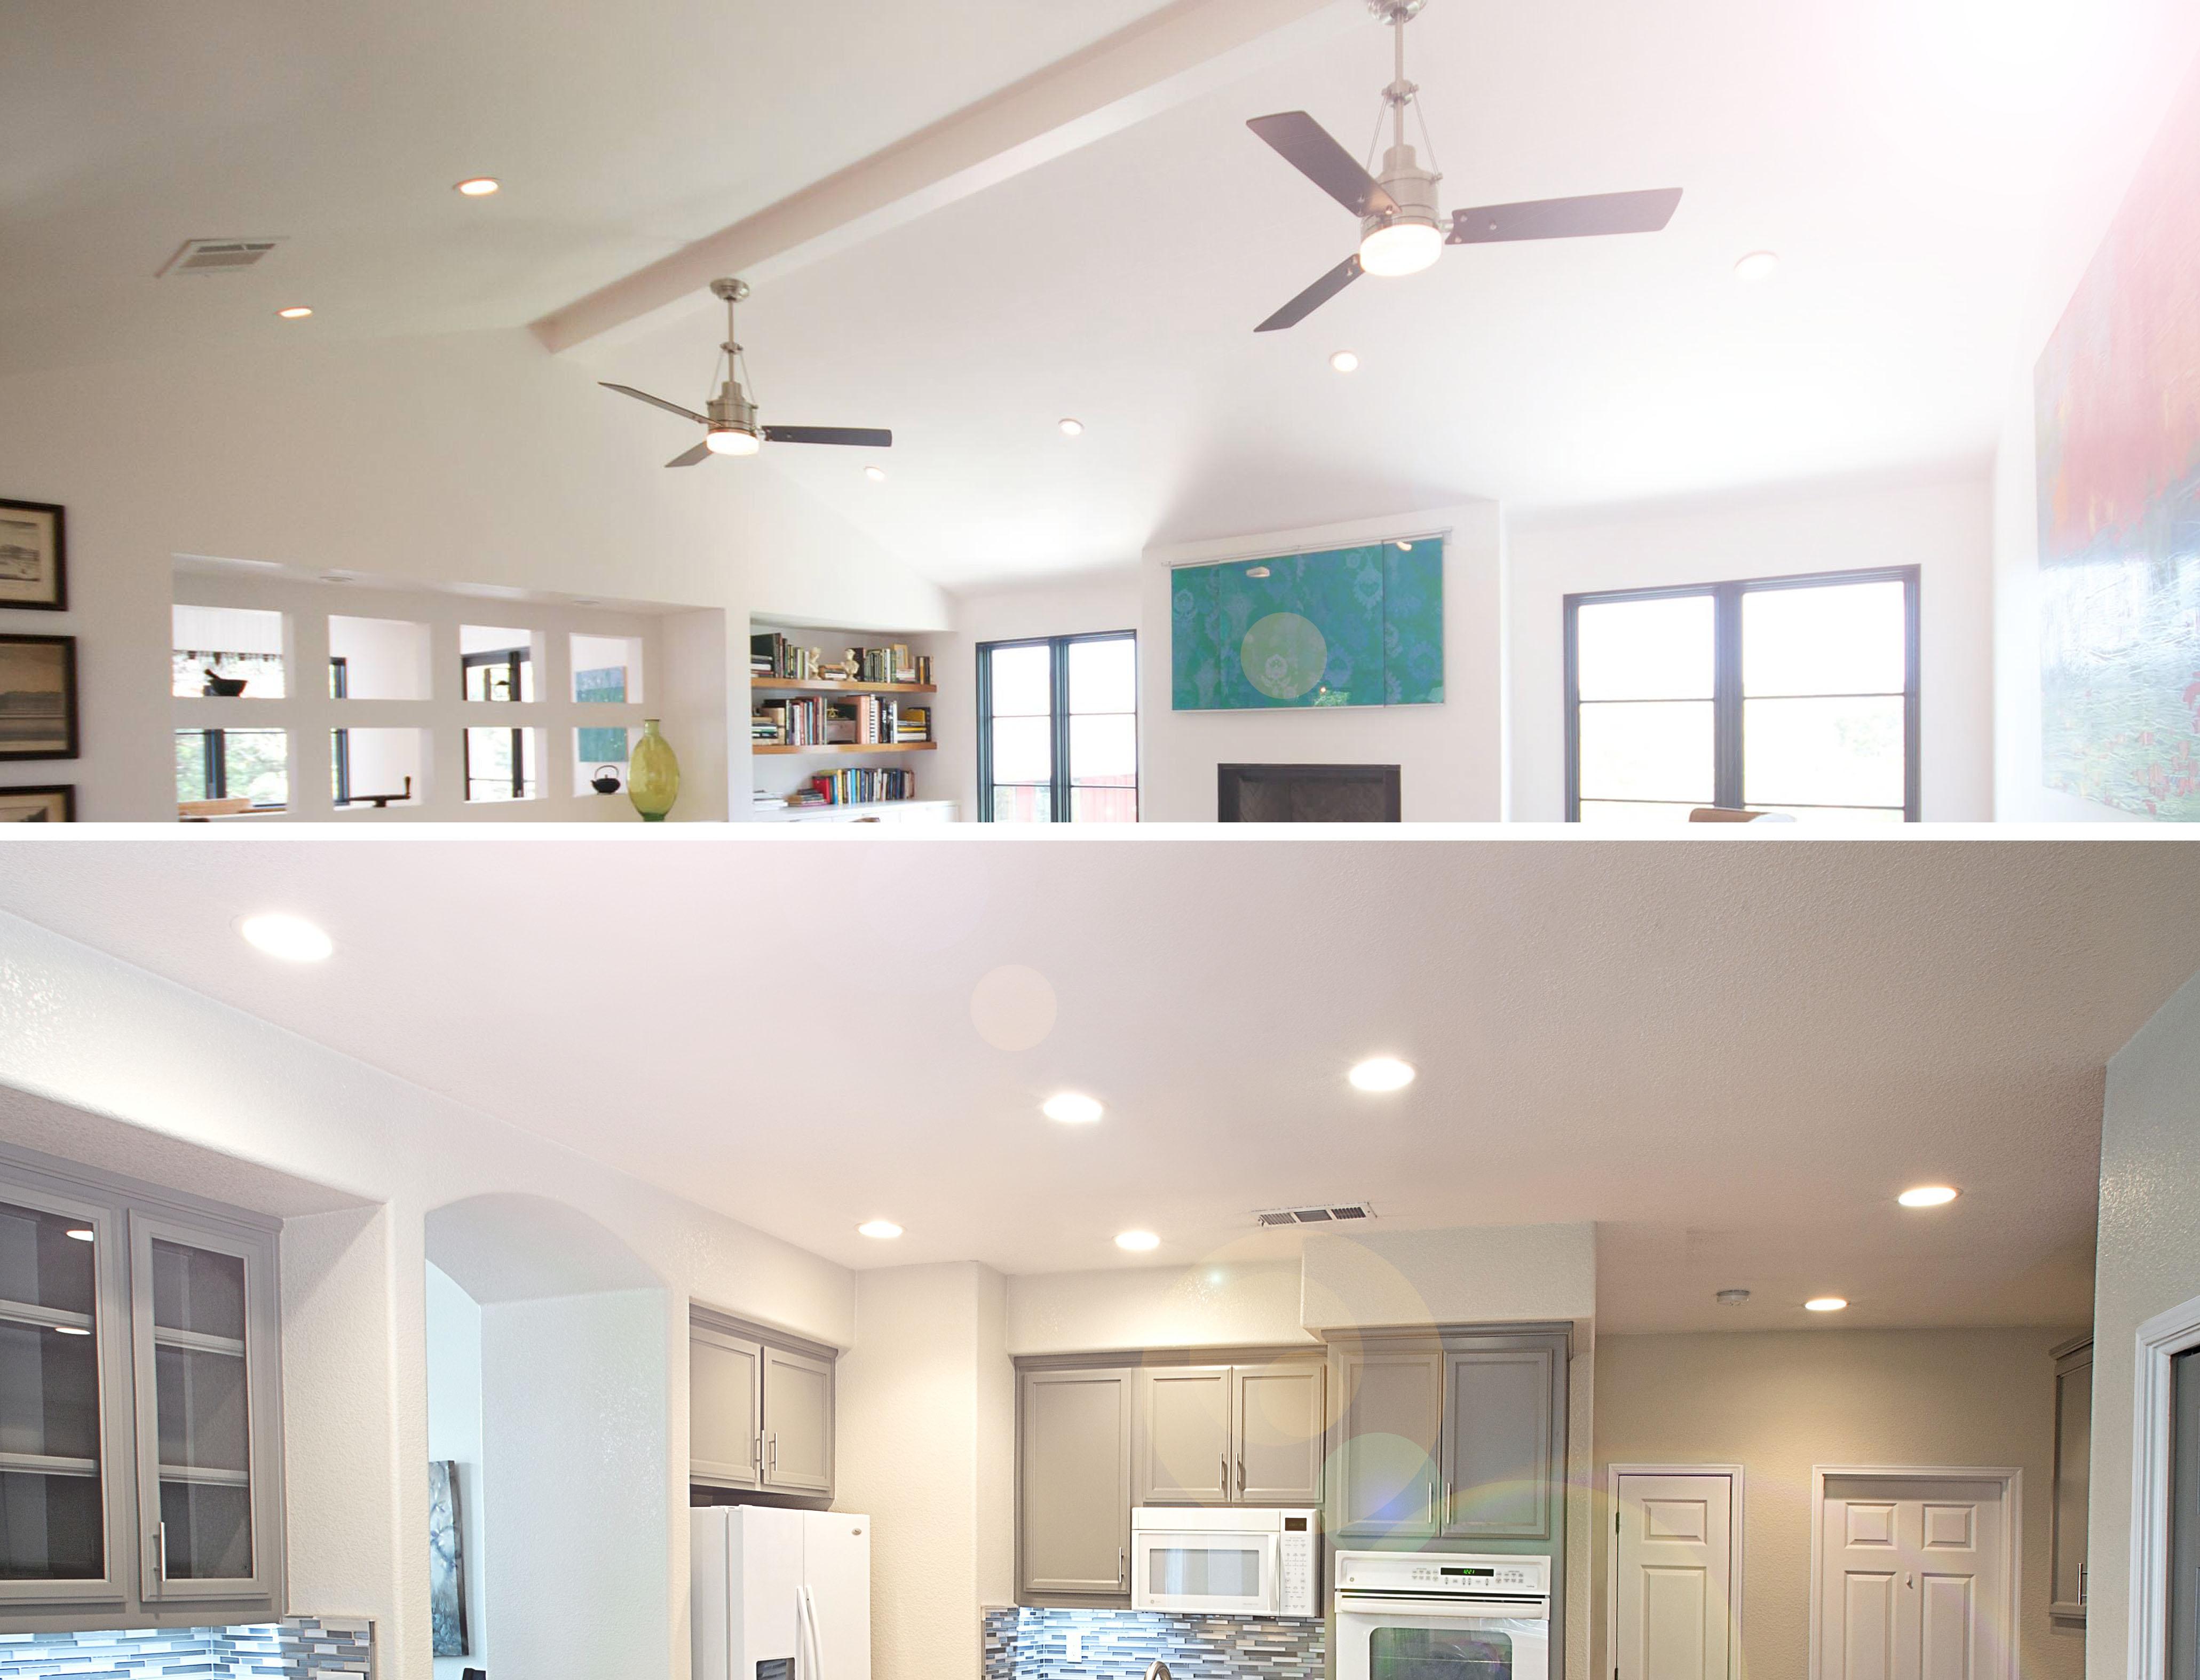 recessed-lighting-ceiling-fan-installation